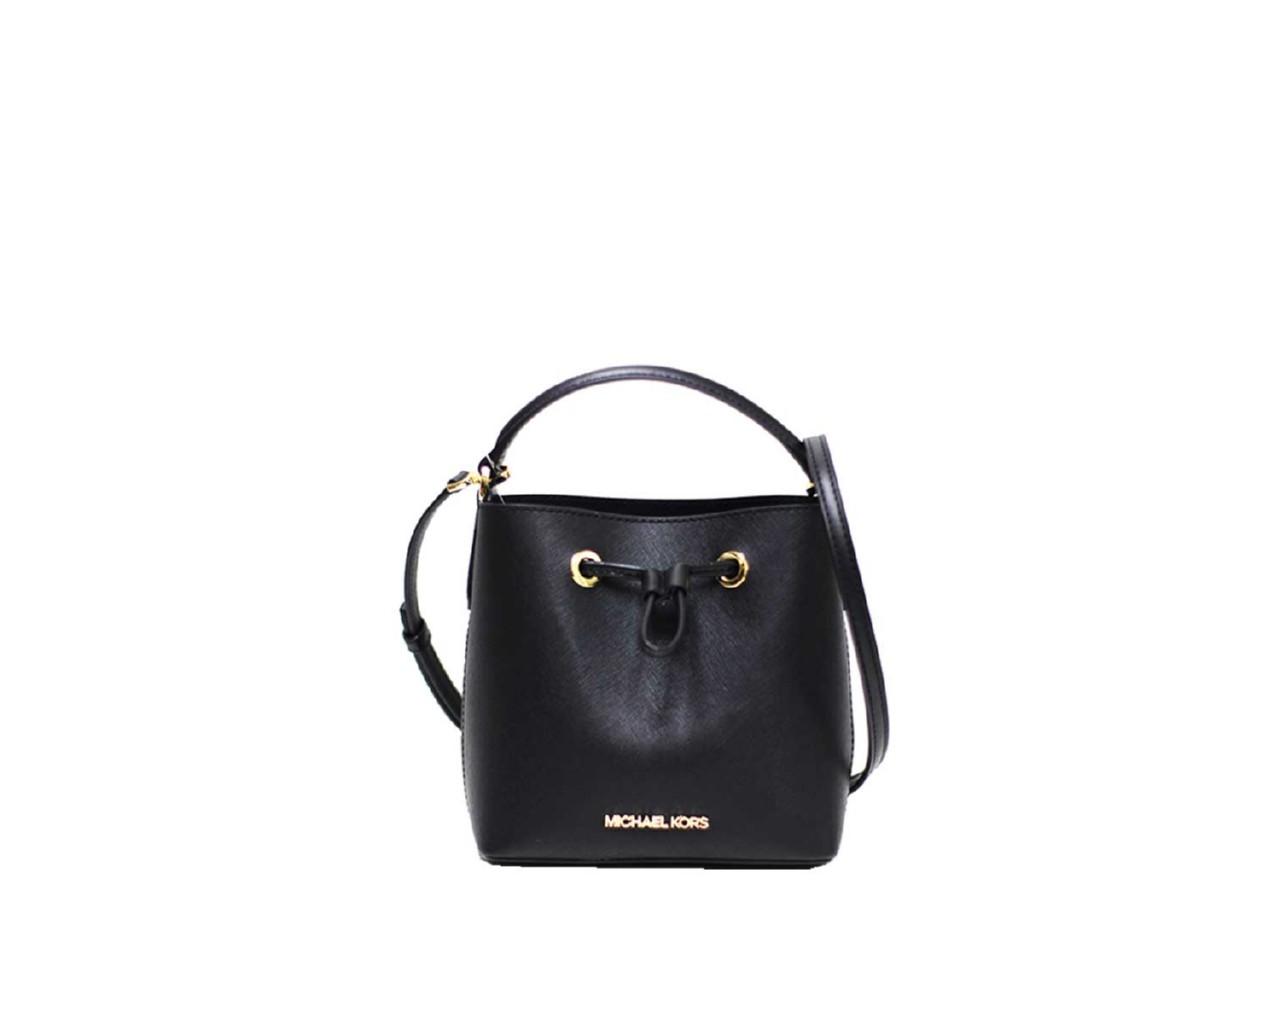 Michael Kors Women's Suri Small Bucket Crossbody Bag Black MK30368